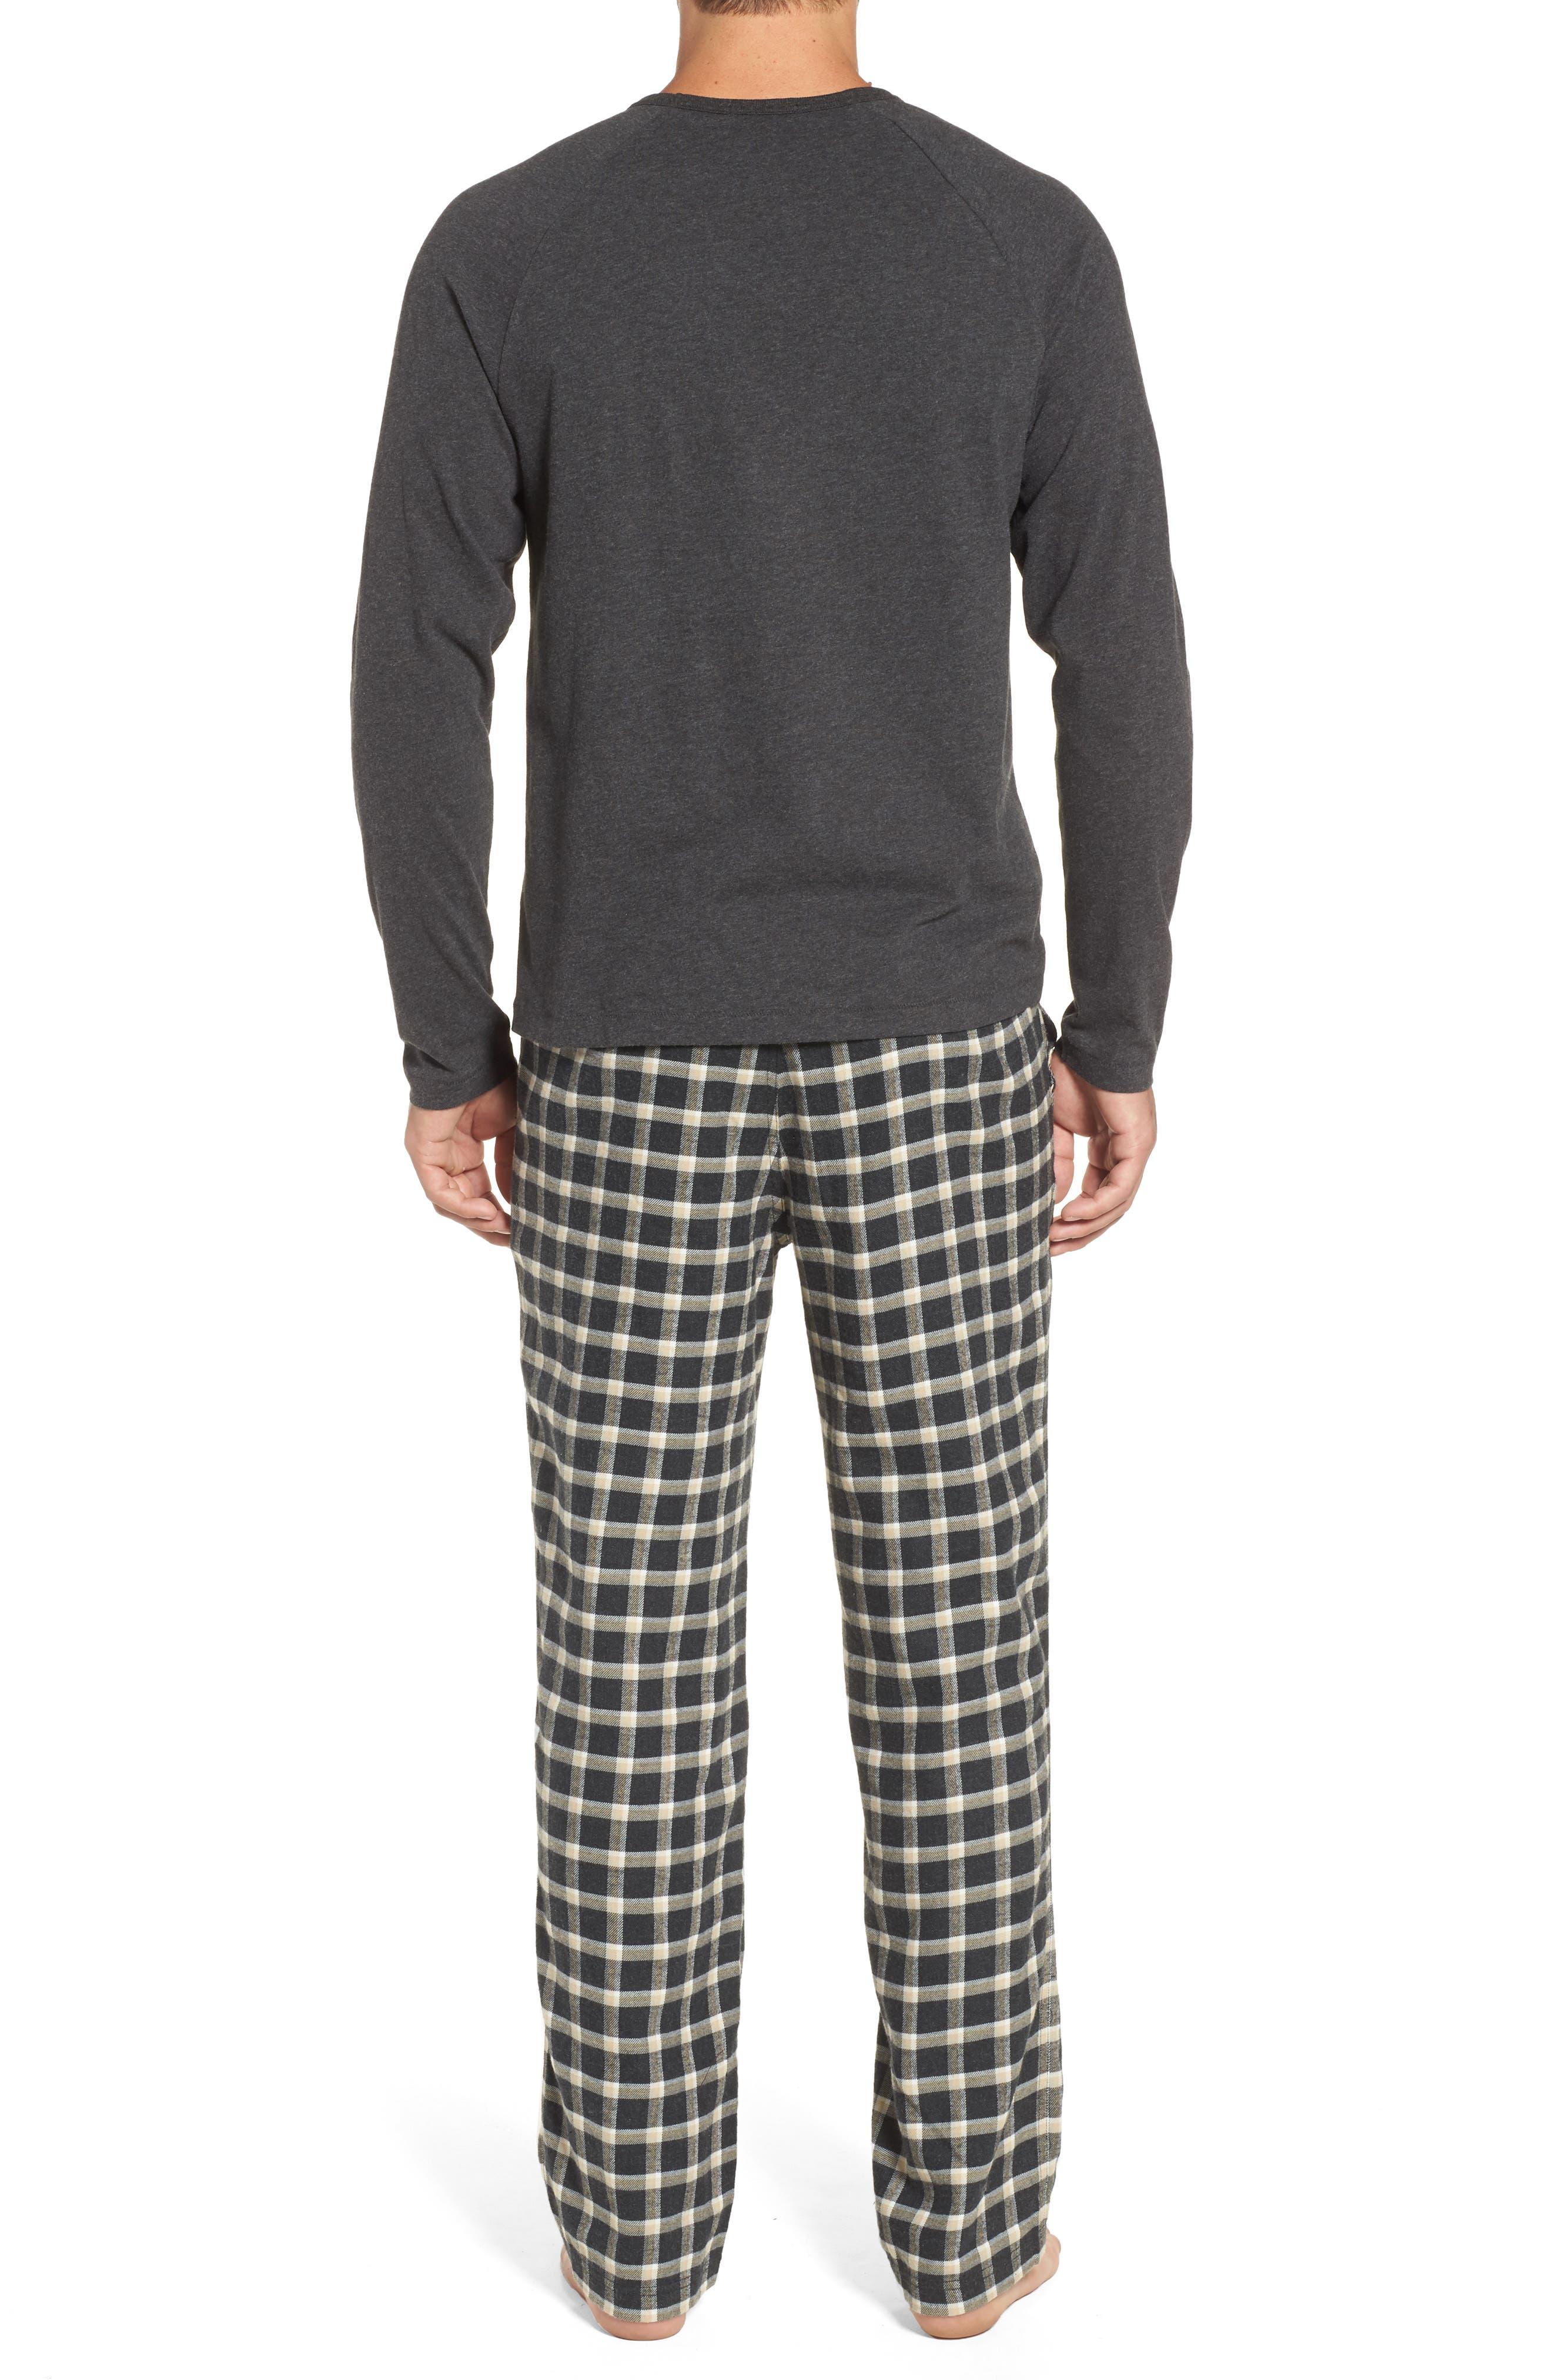 Steiner Pajama Set,                             Alternate thumbnail 4, color,